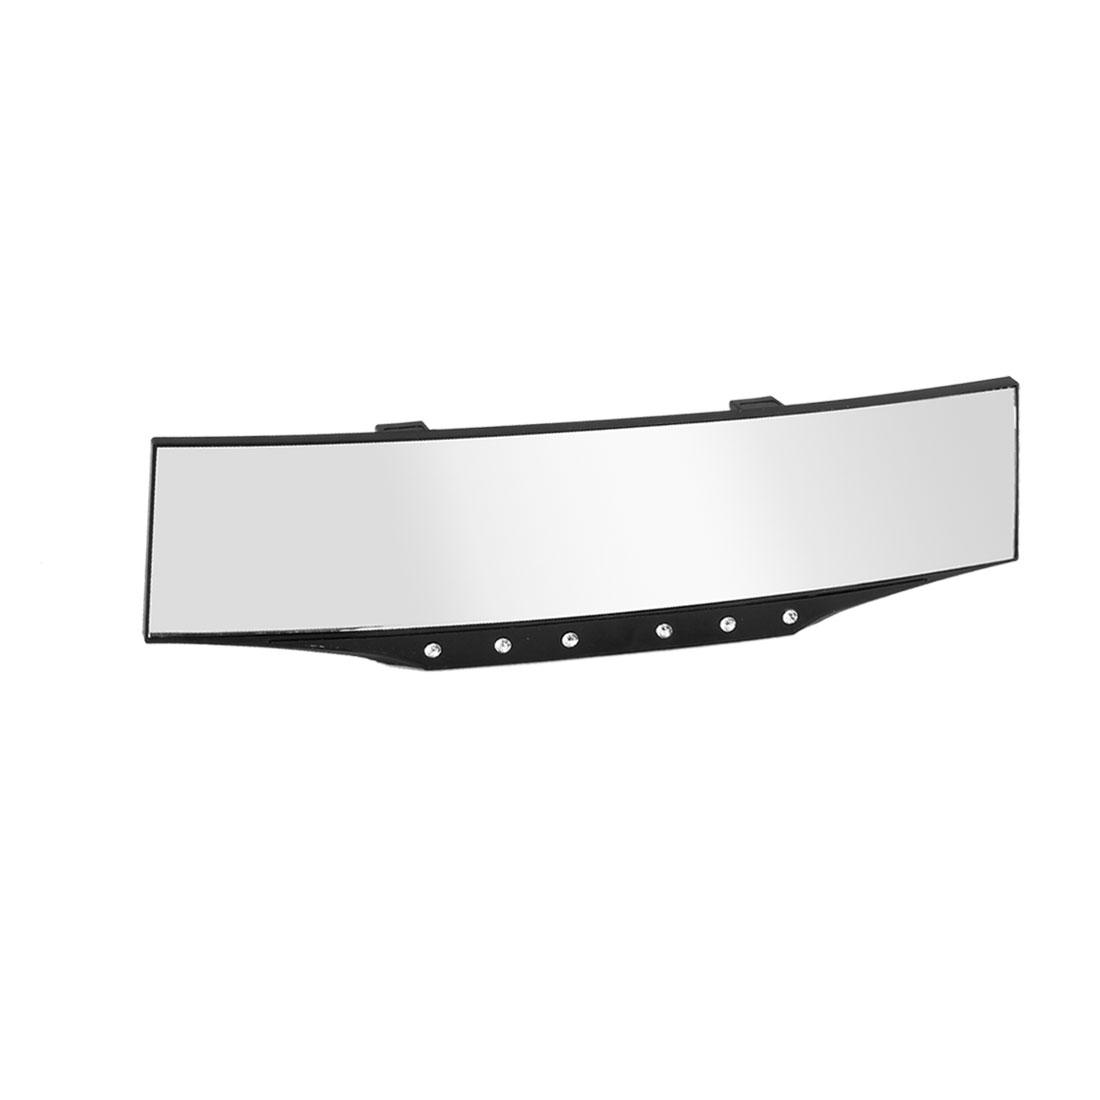 Black Plastic Rhinestone Inlaied Curve Car Interior Rear View Mirror 300mm